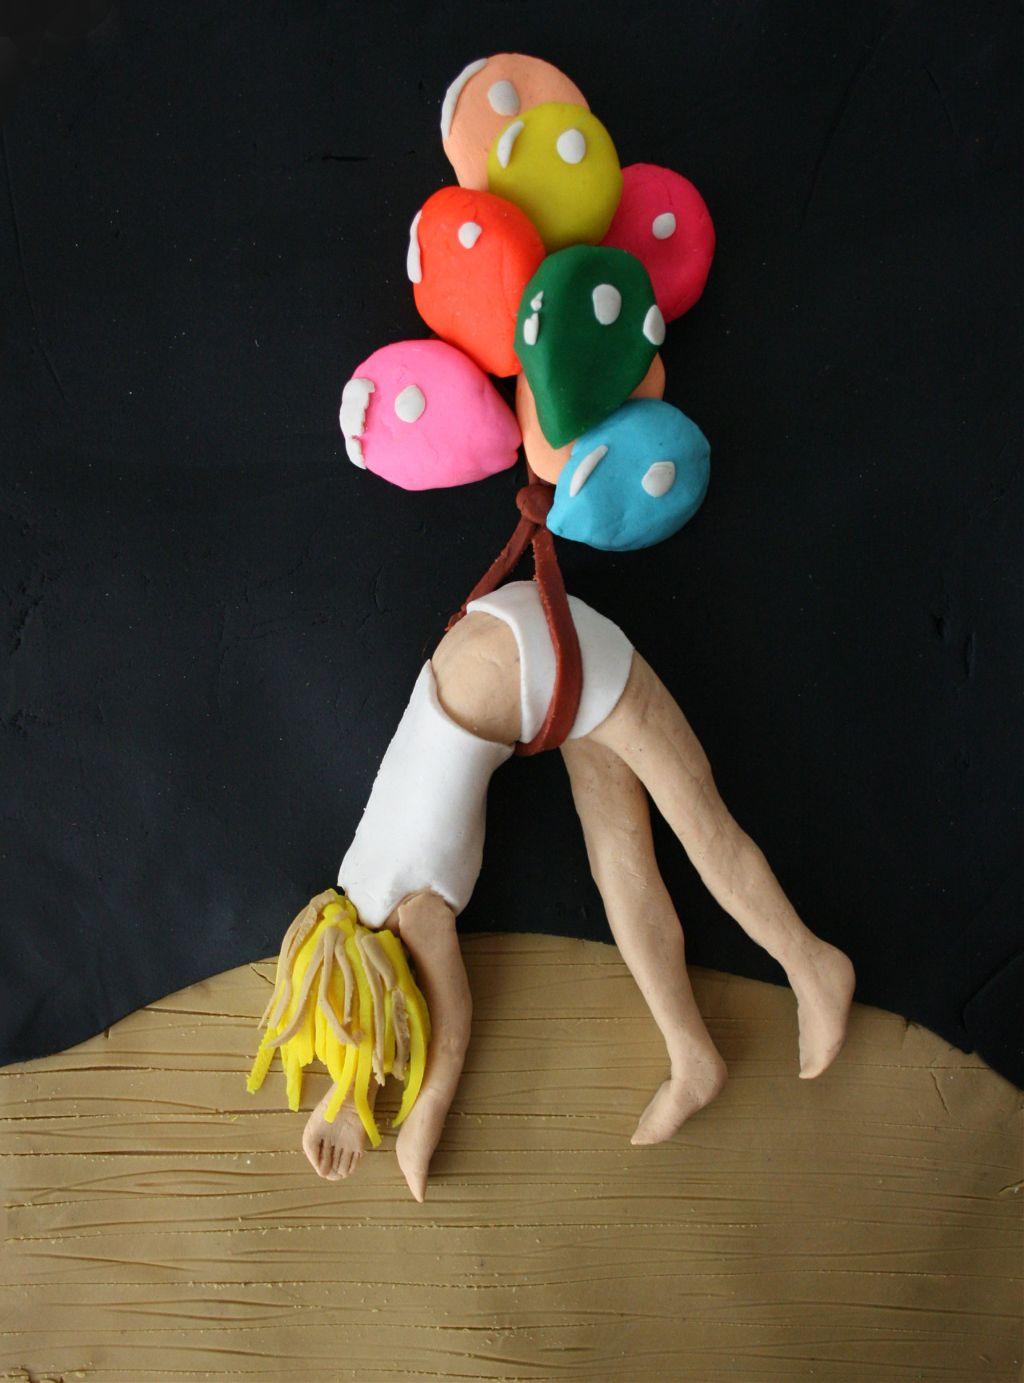 escape artist in play doh